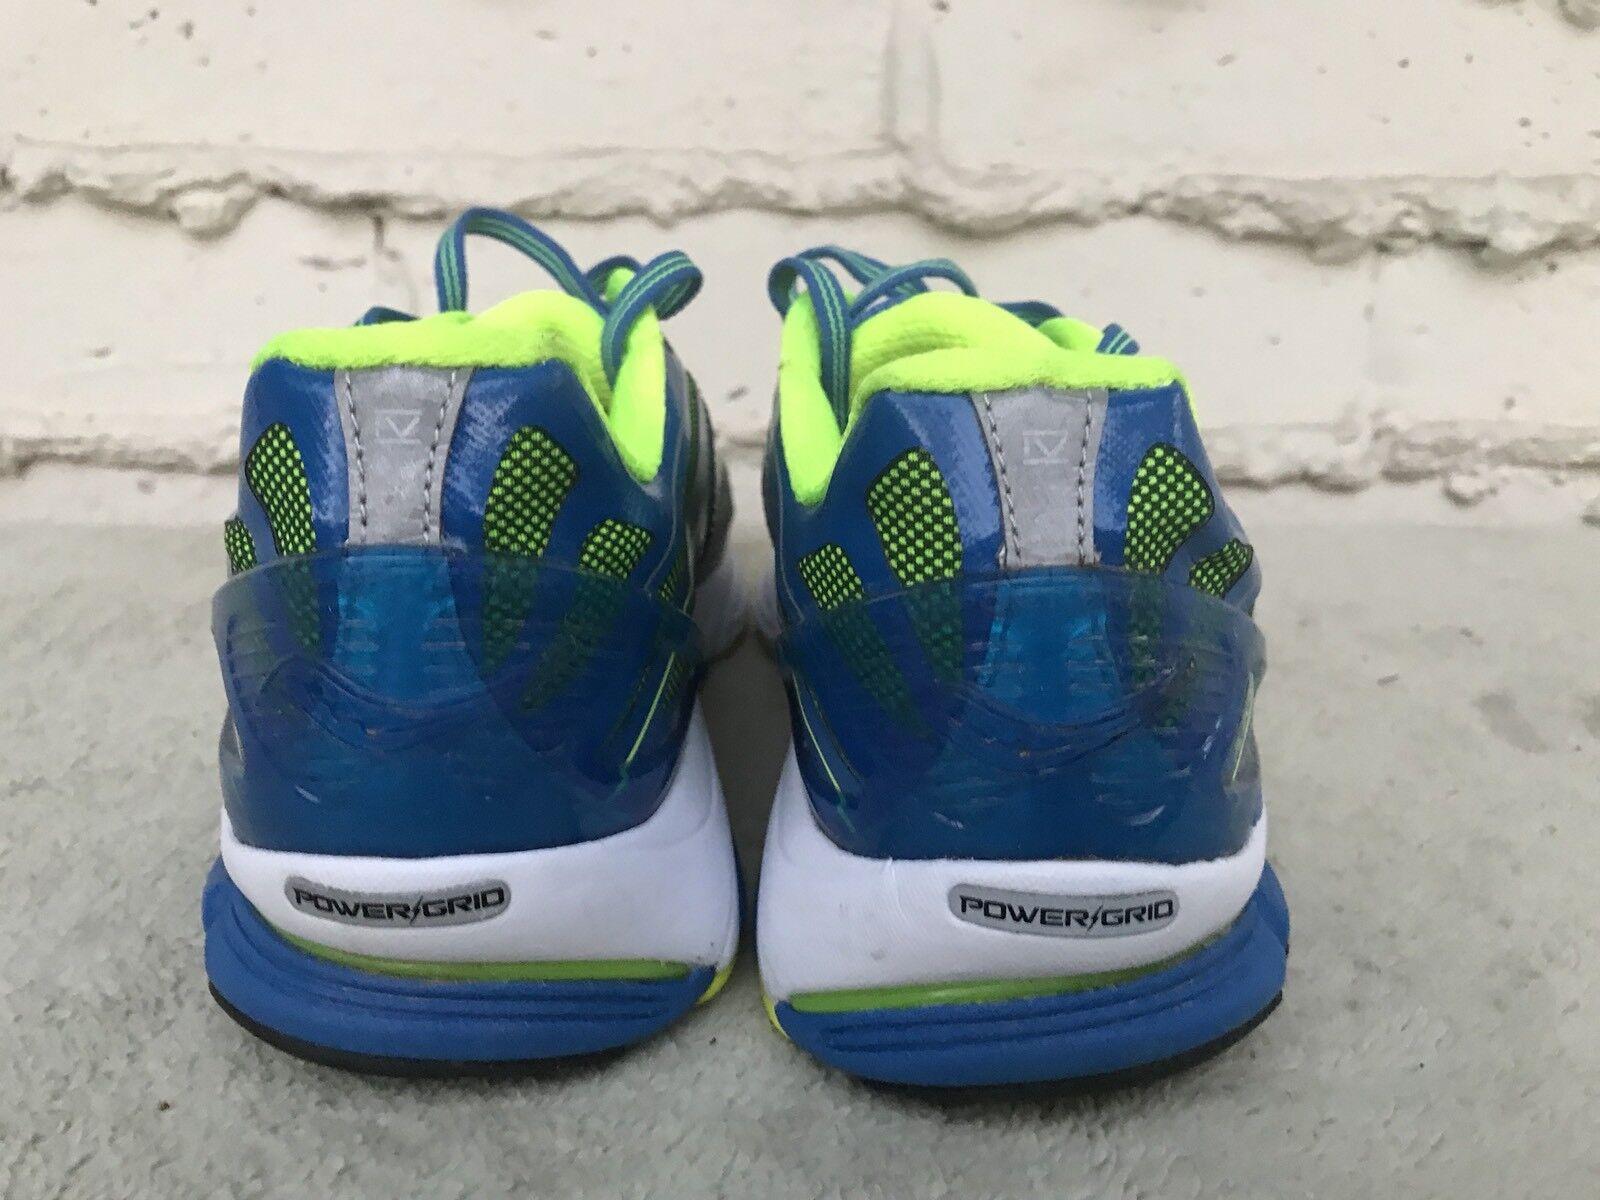 MINT Saucony Men Cortana 4 10 Running Schuhe Silver/Blau/Citron US 10 4 EUR 44 S20240-1 4aa1f1